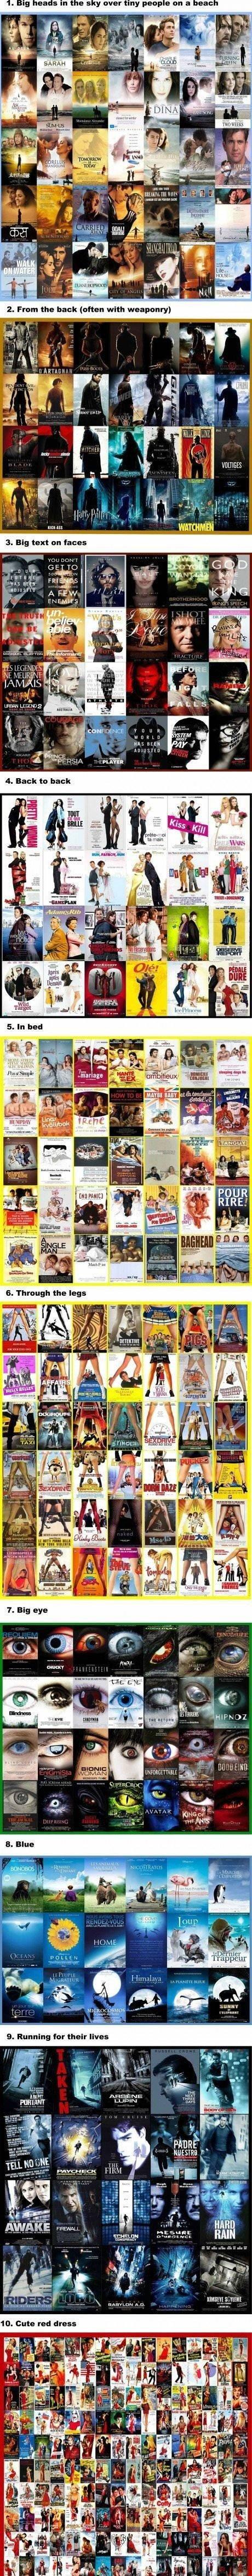 movies. . Gd my q A FEW ANEM\ Es maul W I was. not many choices left... movies Gd my q A FEW ANEM\ Es maul W I was not many choices left